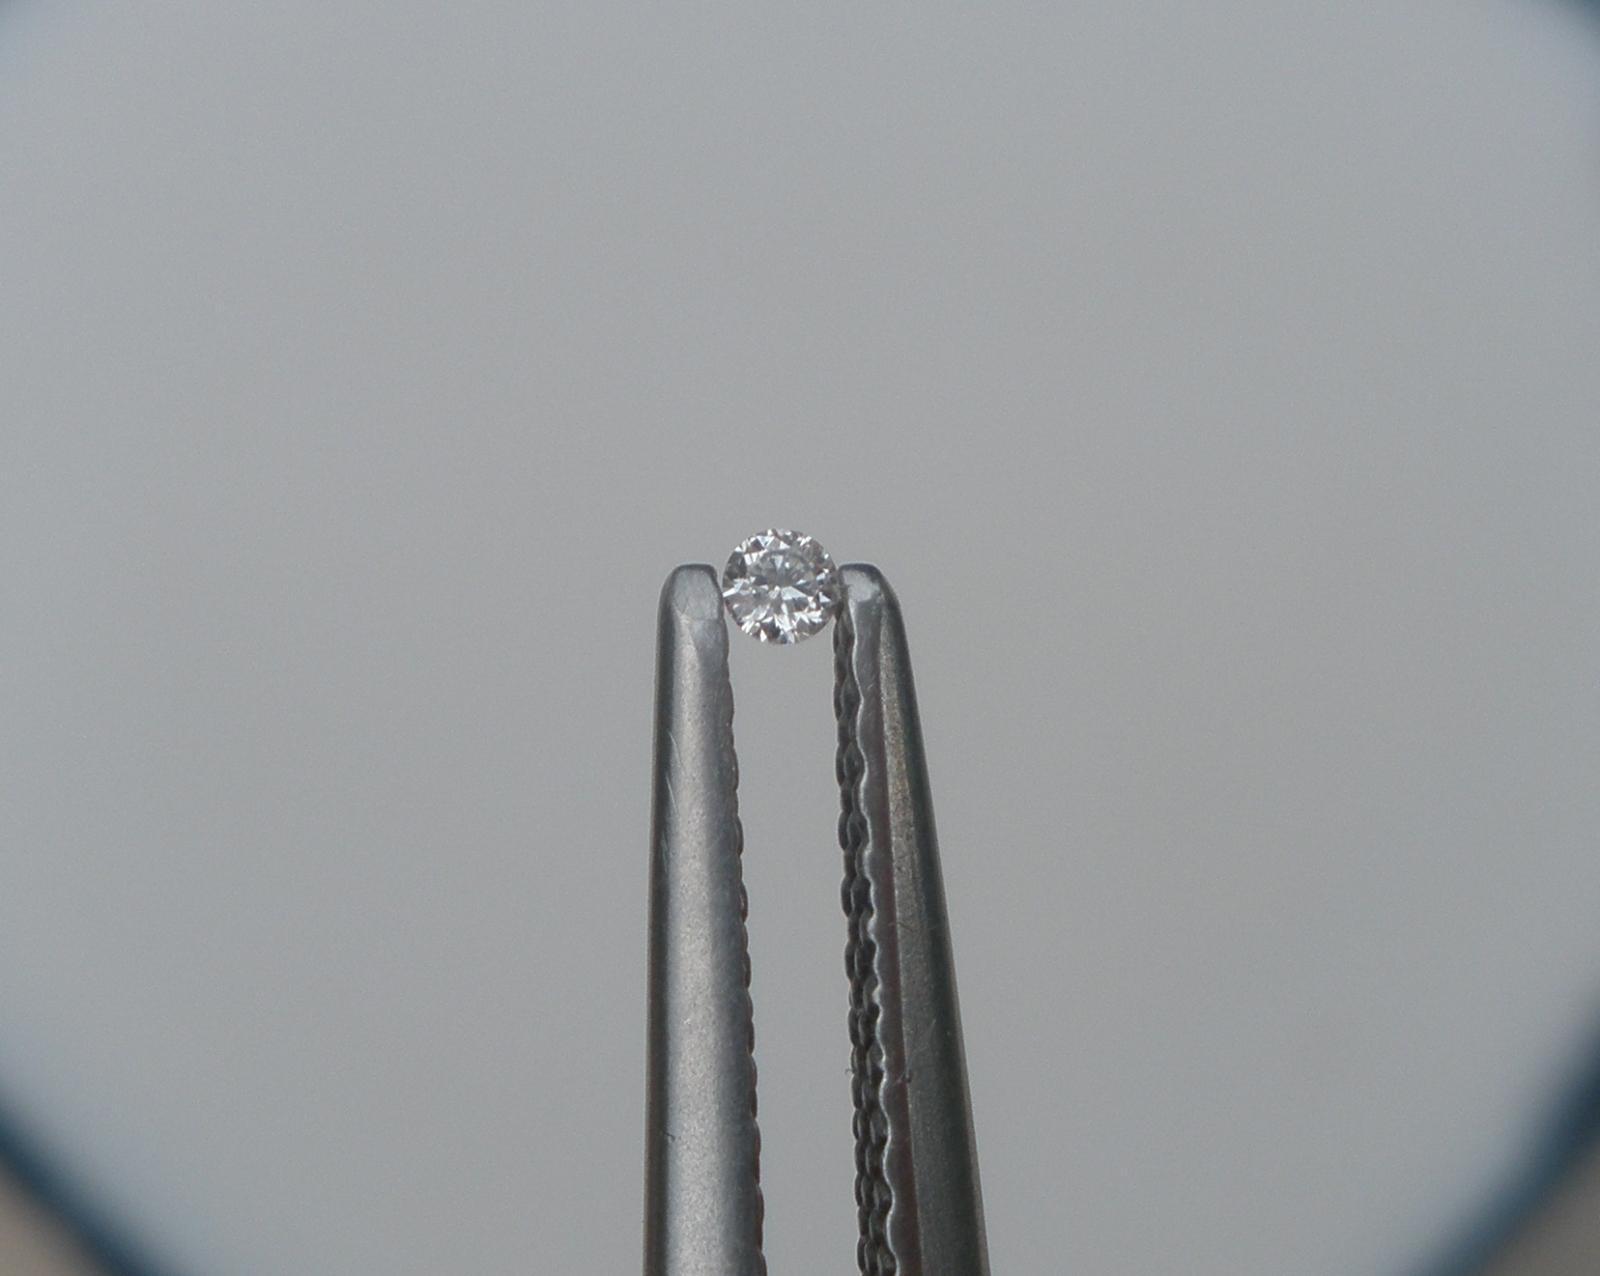 STAINLESS STEEL BALL BEARING HINGE 100X75MM GD11 BRASS